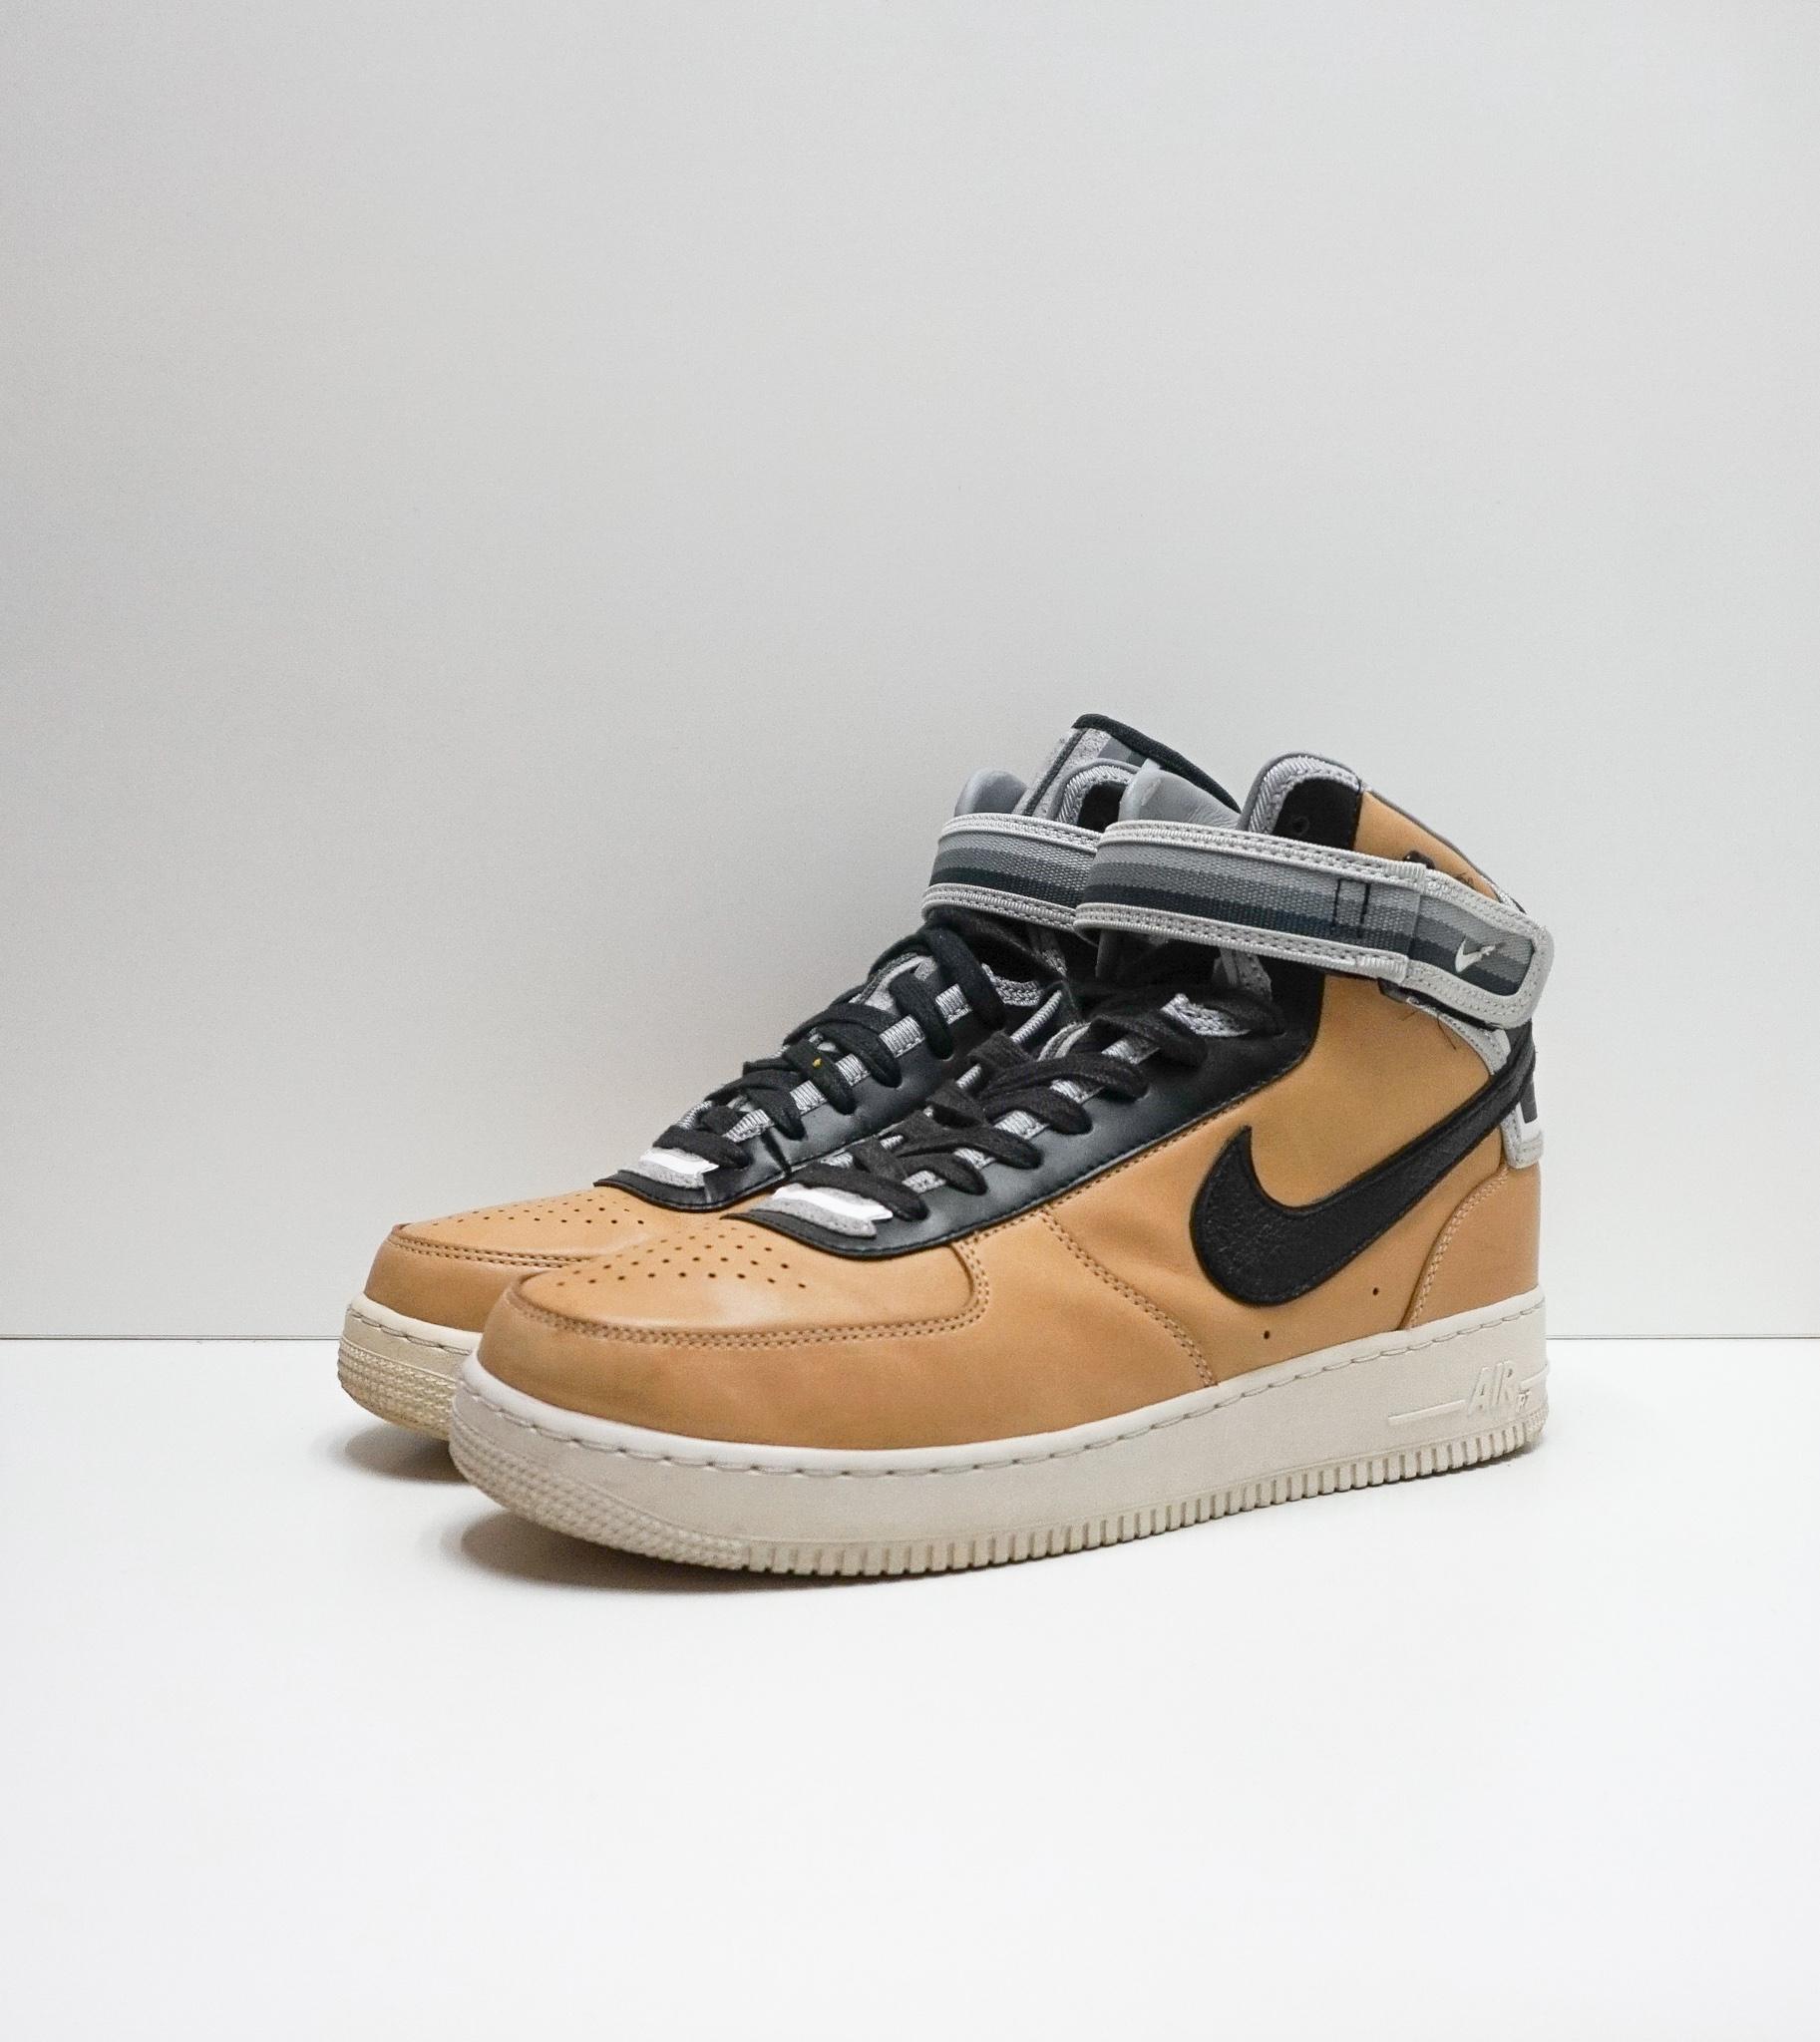 Nike Air Force 1 Mid Riccardo Tisci